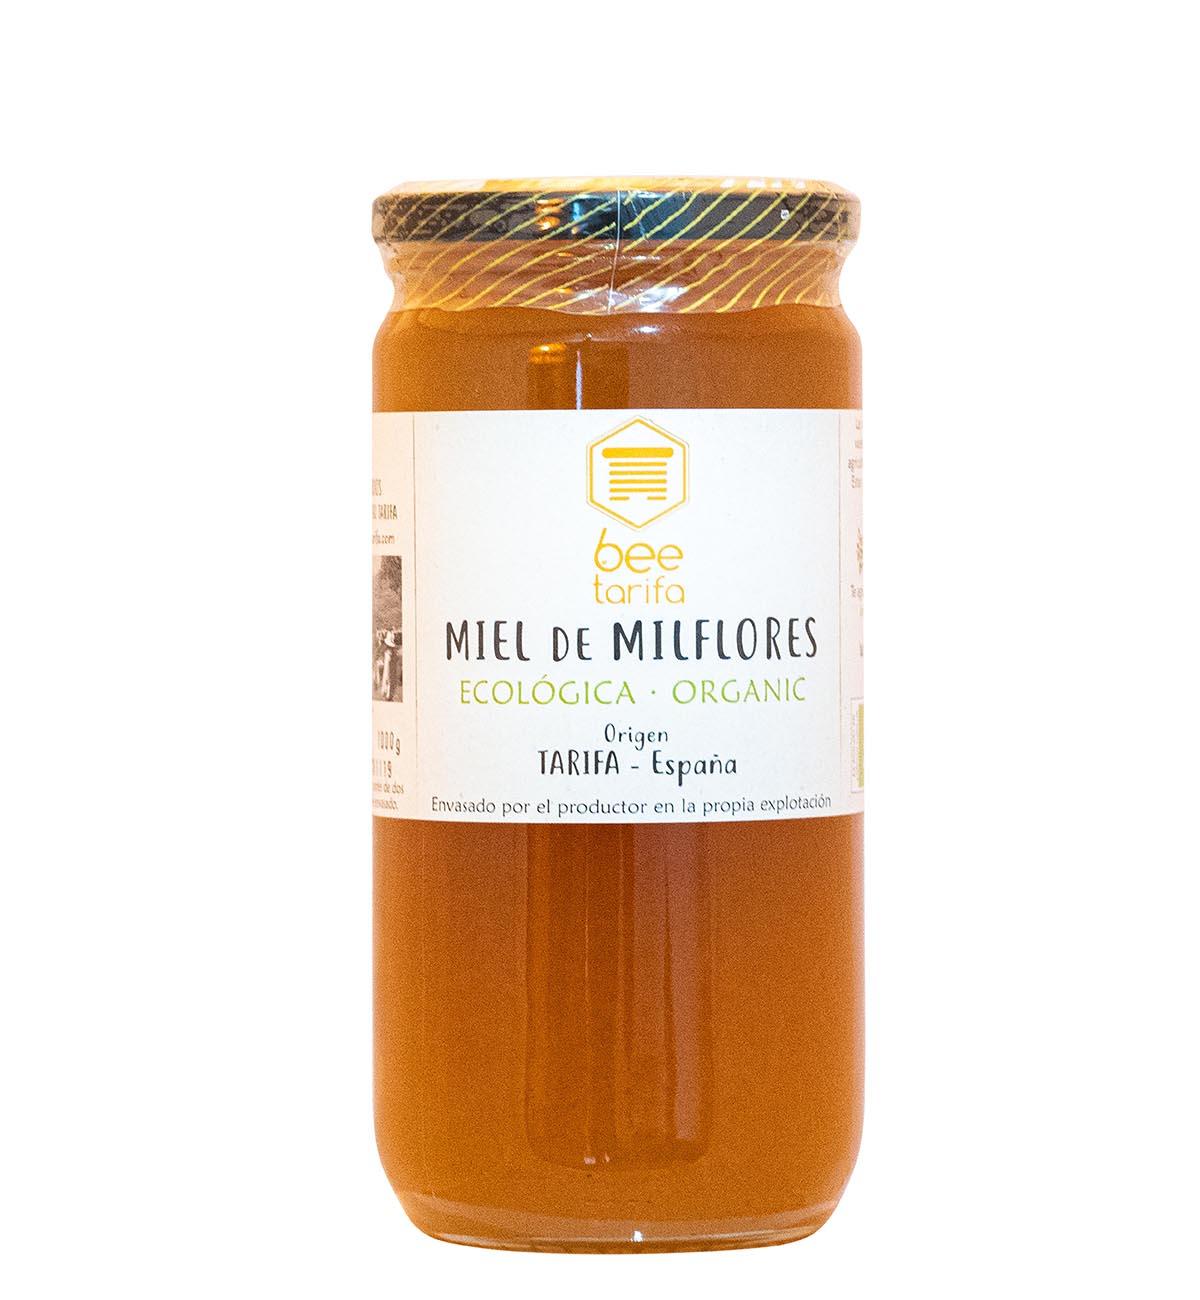 Miel Milflores Ecologica 1 kg Bee Tarifa